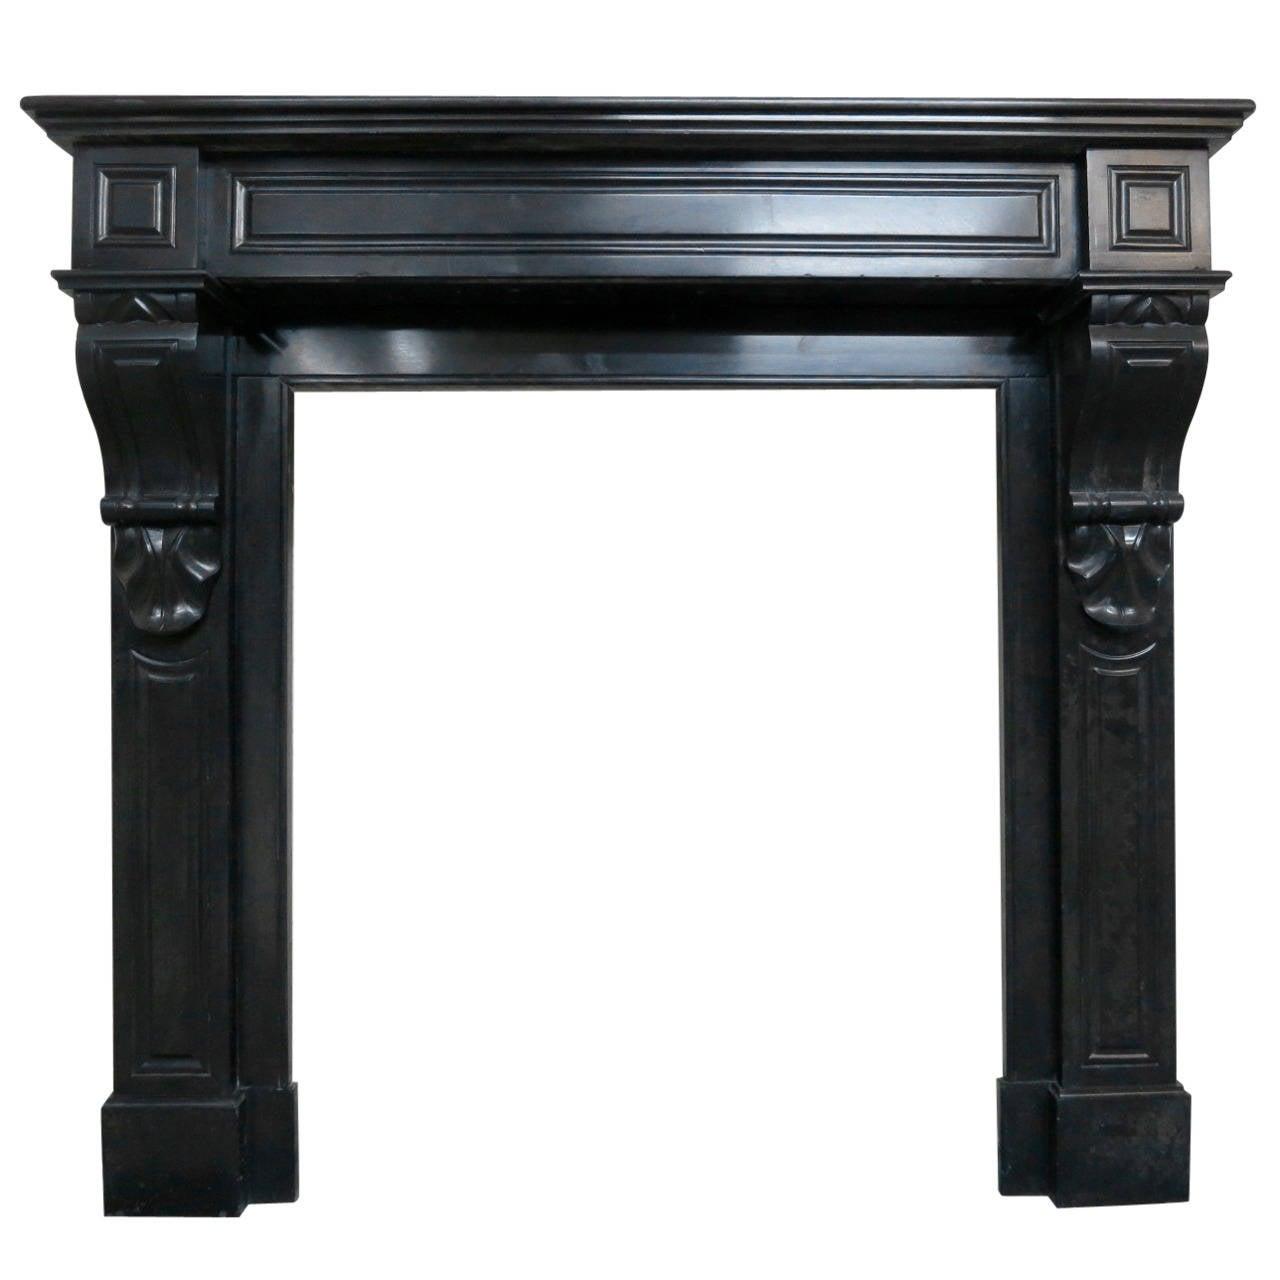 19th Century Louis Xvi Style Belgian Black Marble Fireplace Mantel At 1stdibs